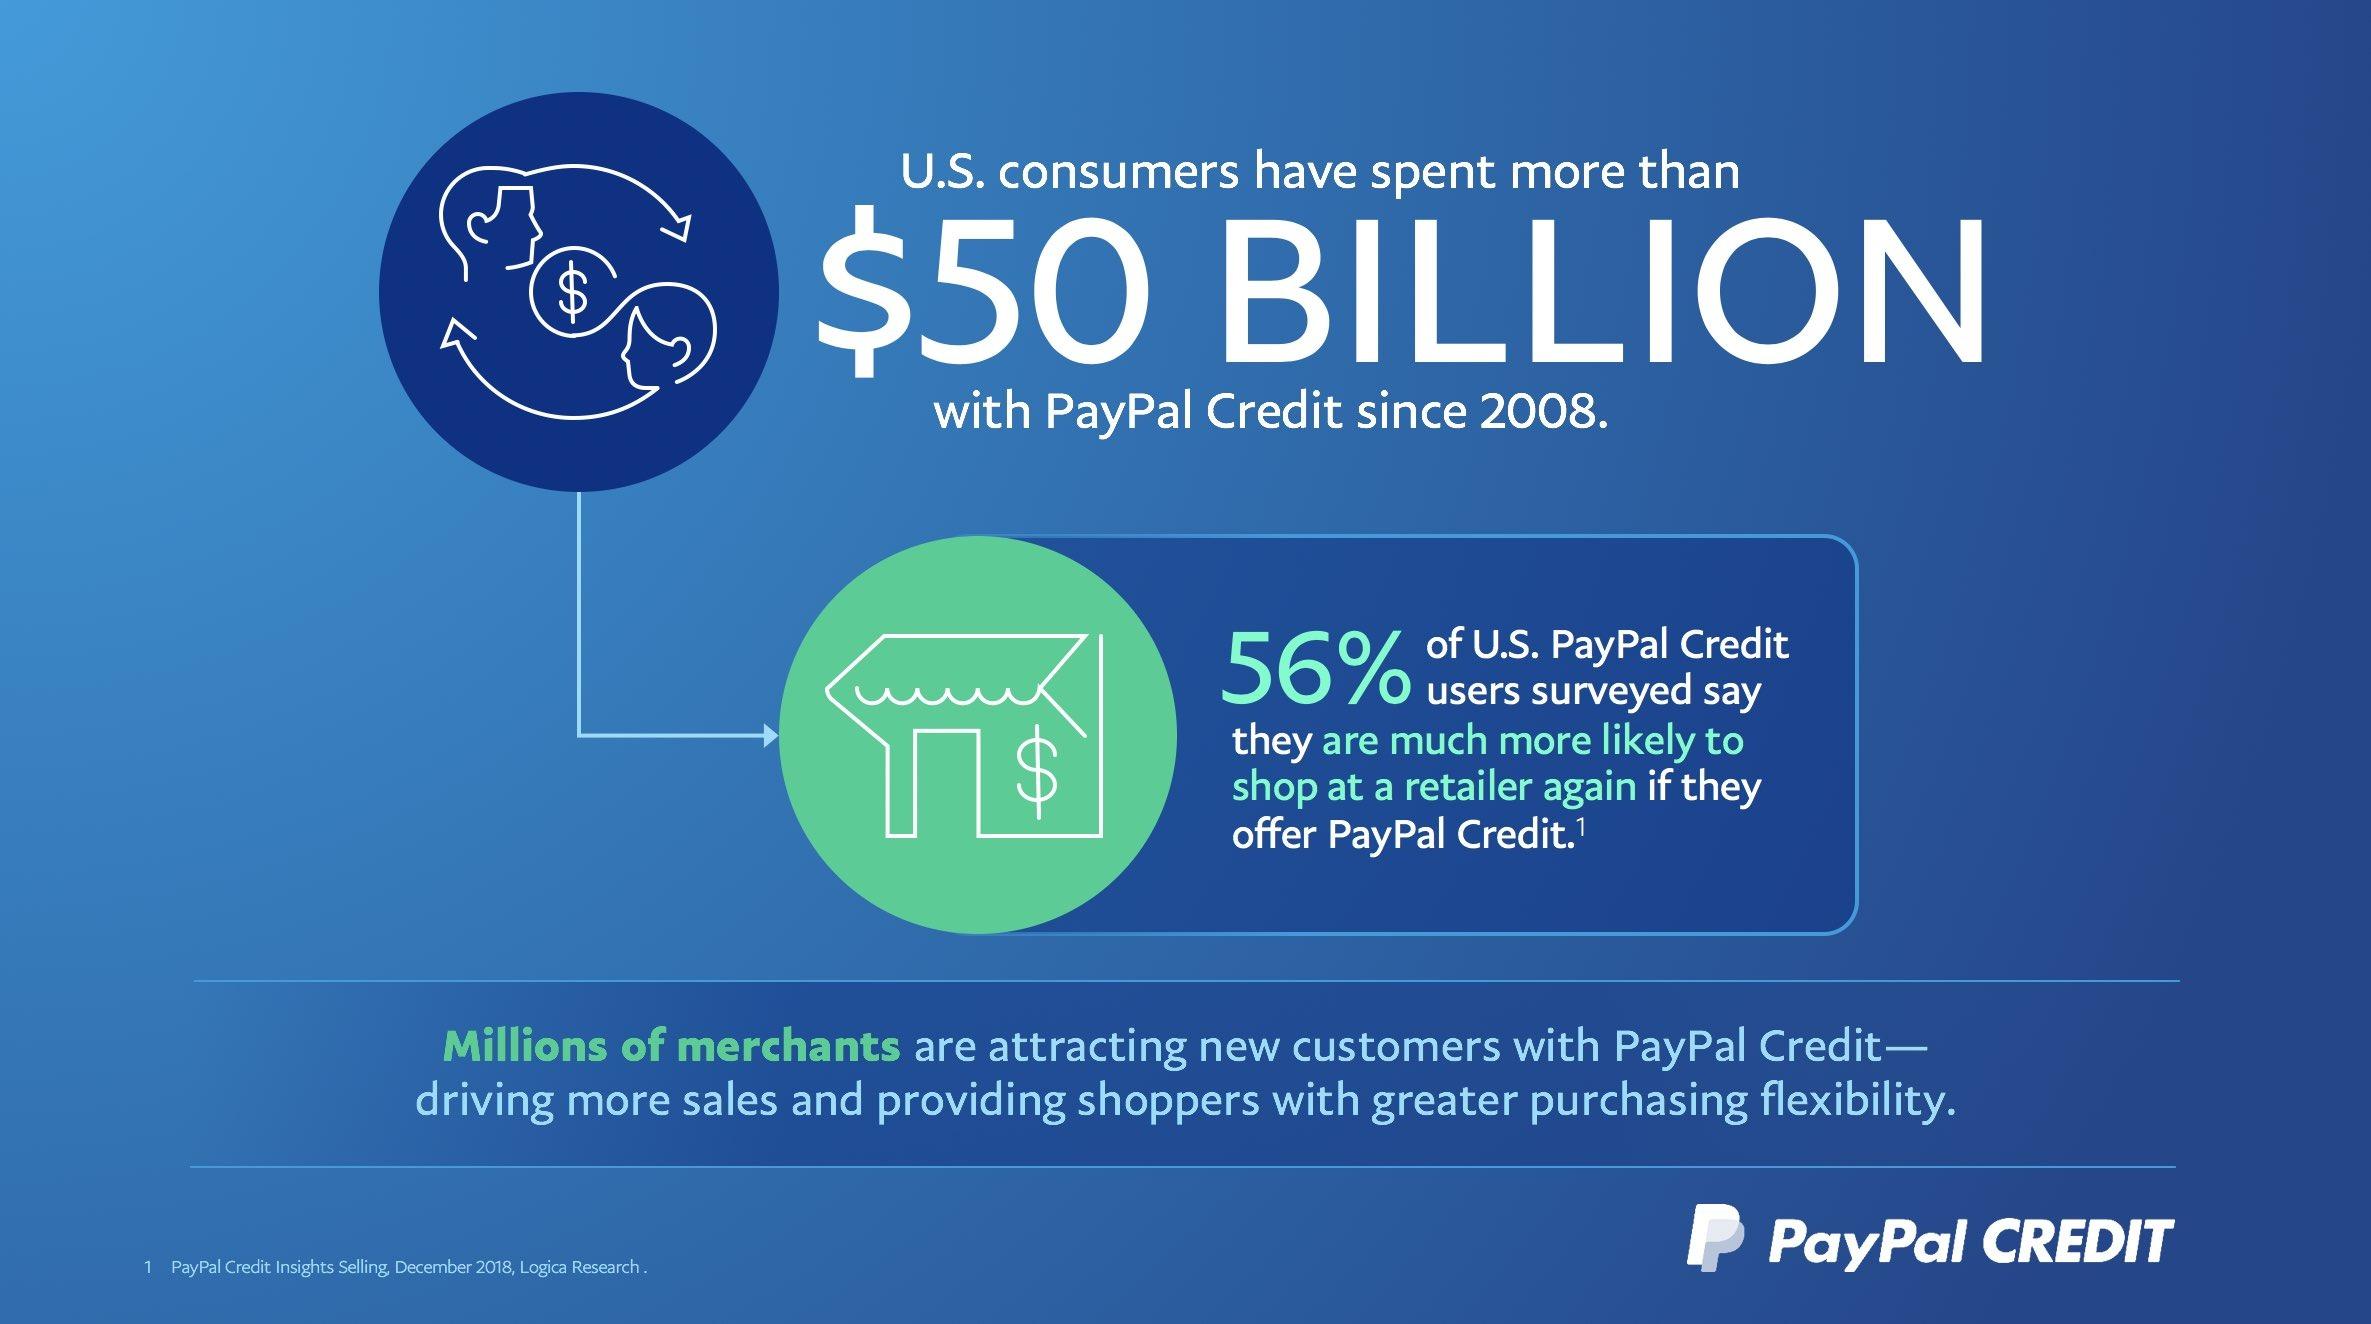 PayPal credit transaction volume reached $50 billion | PaySpace Magazine